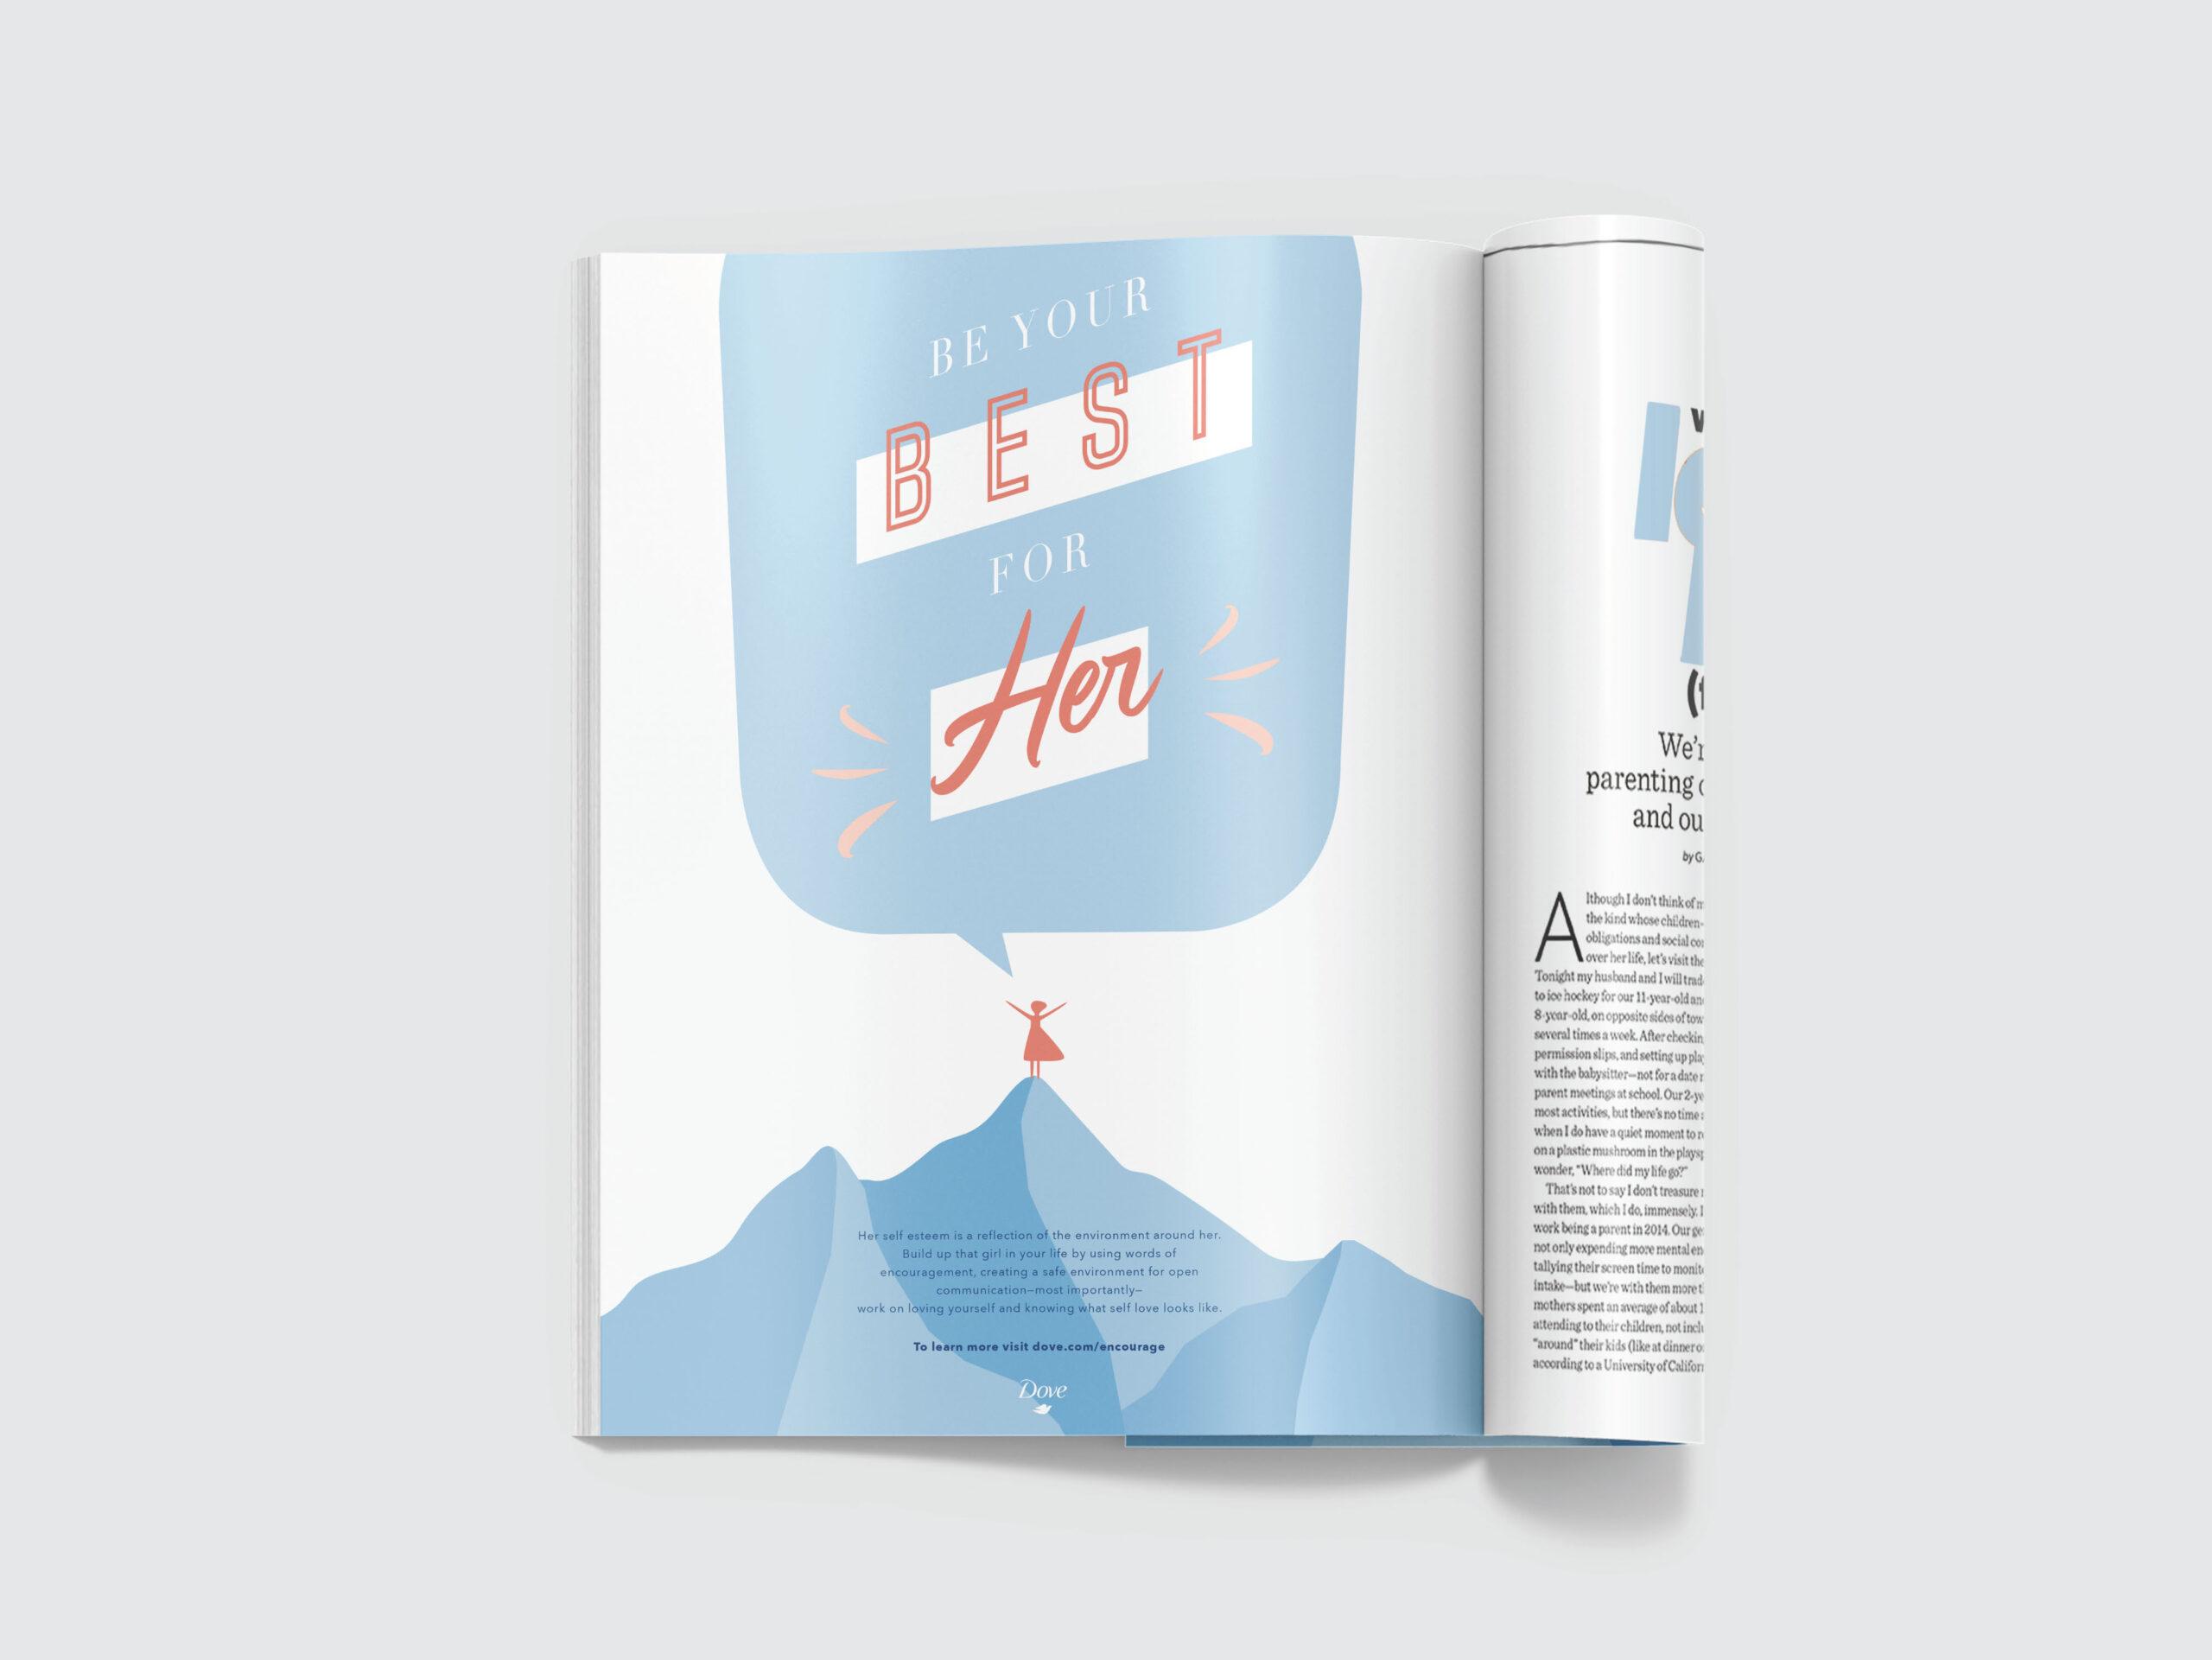 magazine-ad1 copy